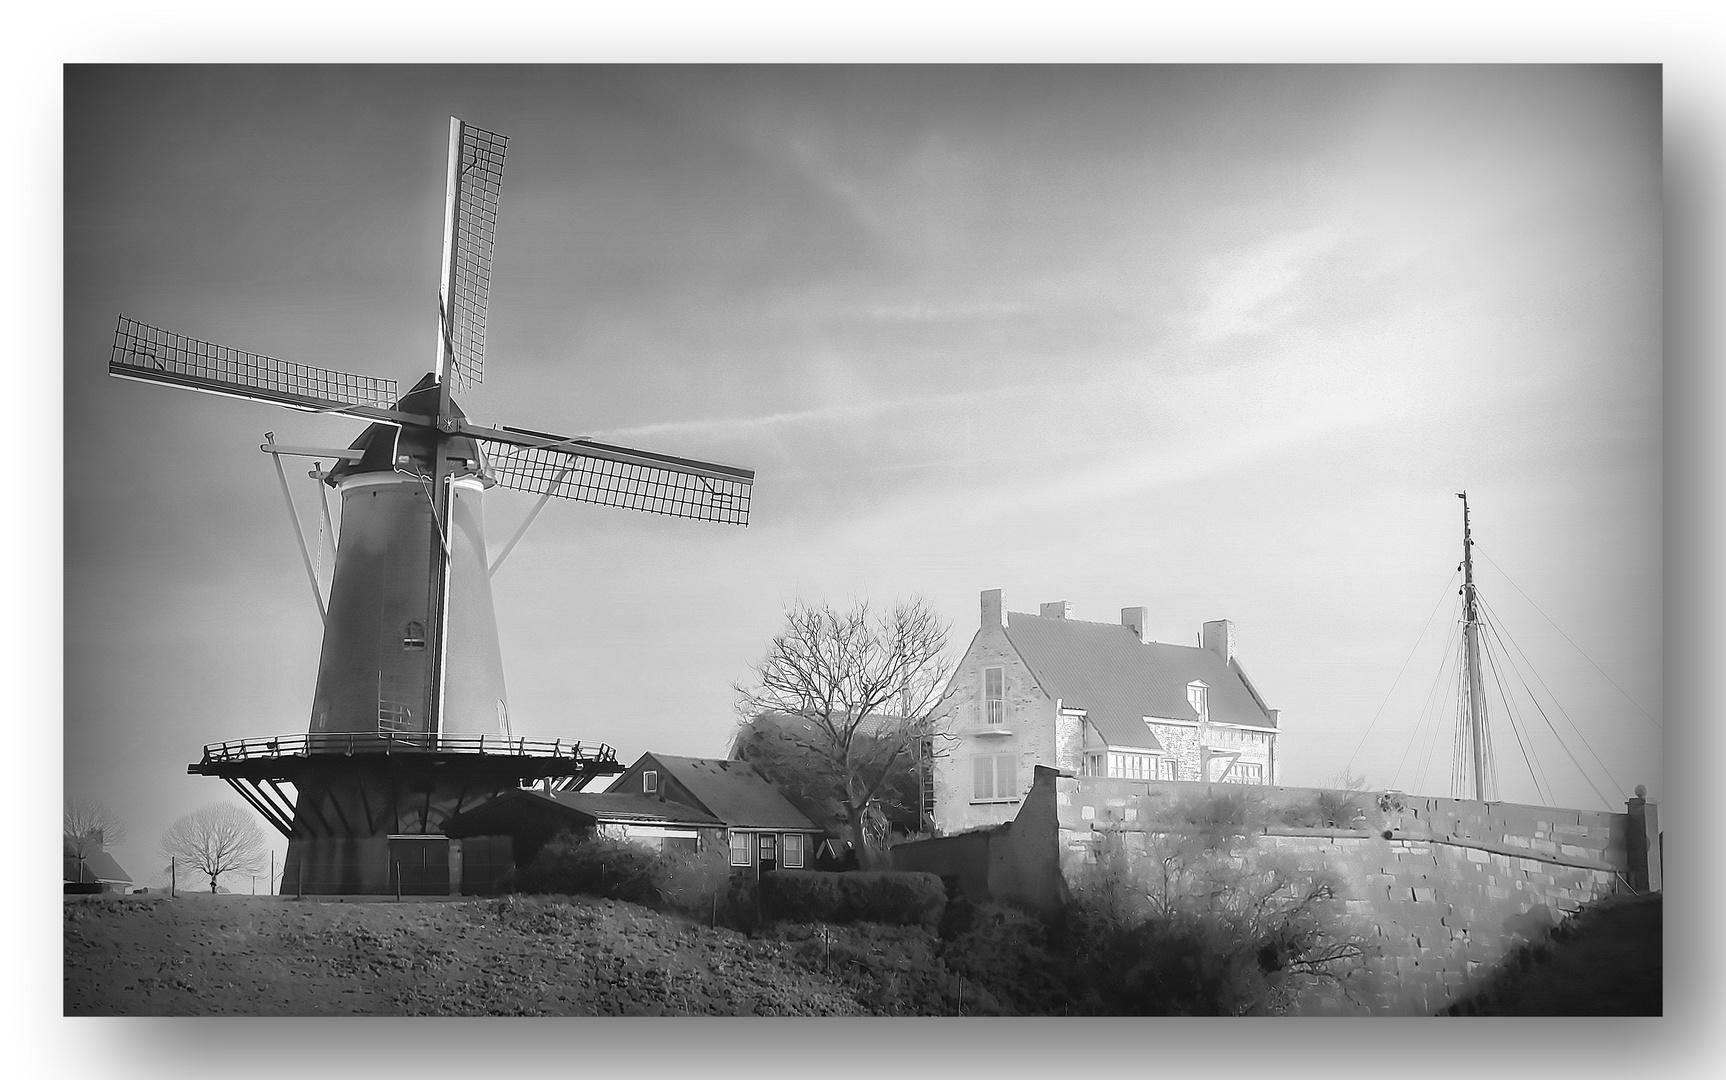 Windmühle SW Zeeland